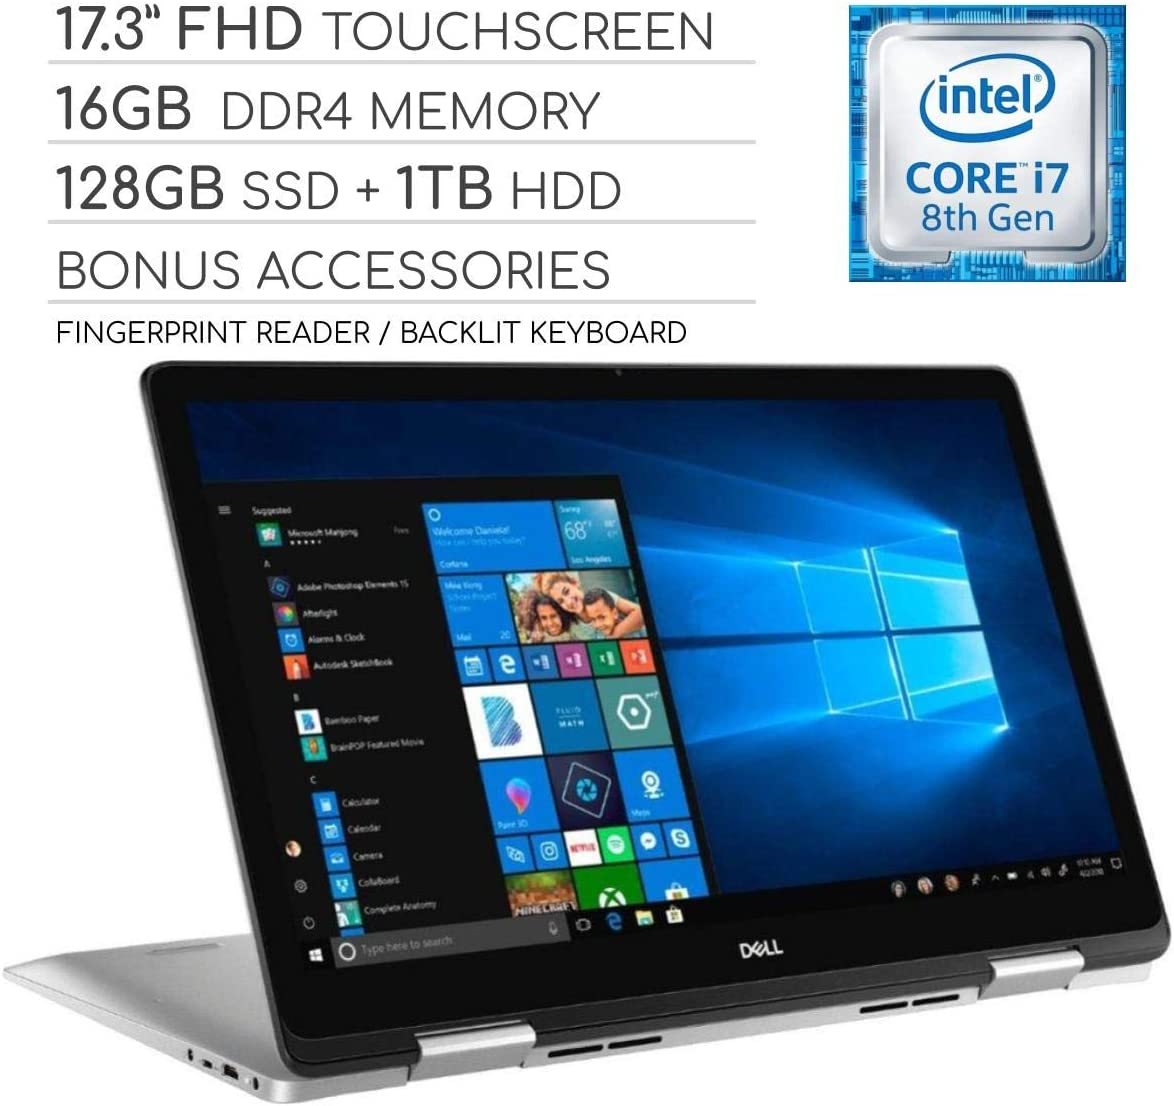 "Dell Inspiron 17 7000 Series 2019 2-in-1 17.3"" FHD Touchscreen Laptop, 4-Core Intel Core i7-8565U 1.8GHz, 16GB RAM, 128GB SSD + 1TB HDD, Backlit Keyboard, Wi-Fi, Bluetooth, Webcam, HDMI, Windows 10"